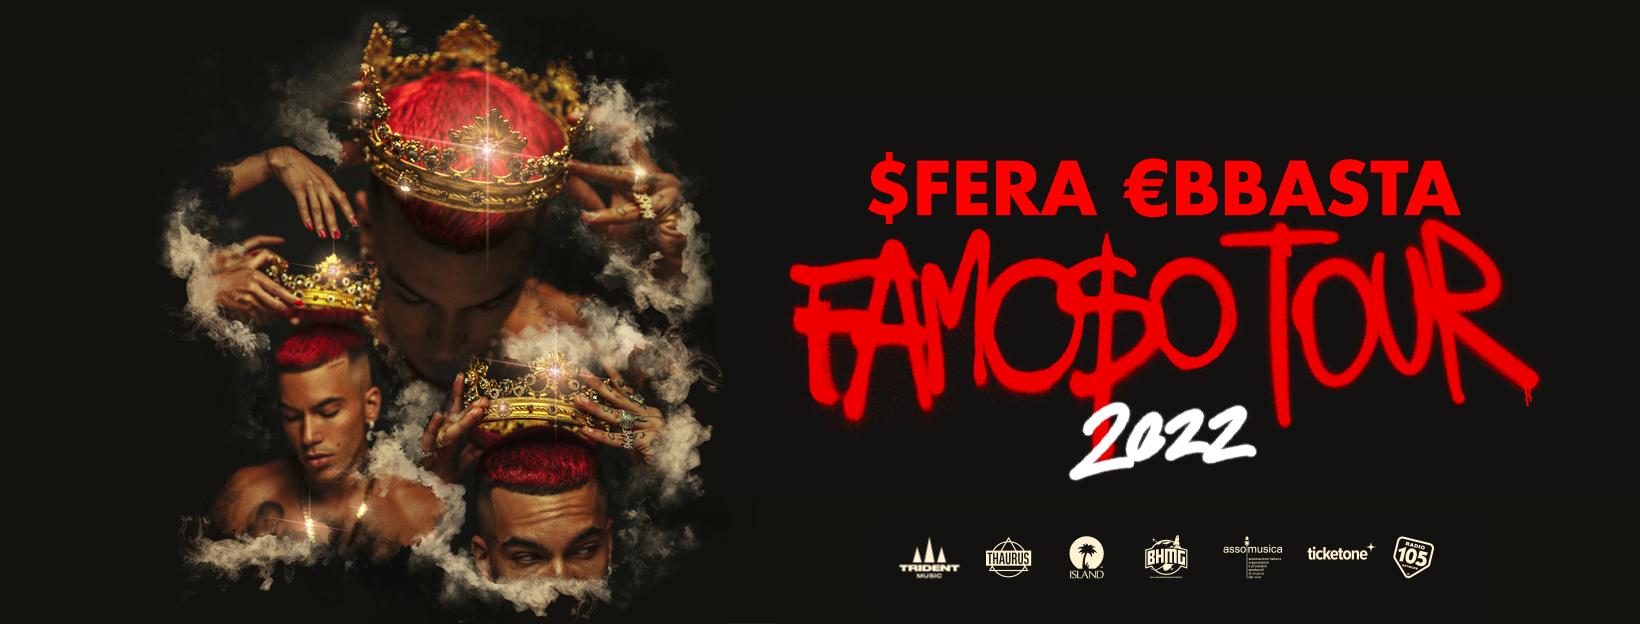 "SFERA EBBASTA - ""FAMOSO"" TOUR 2022"